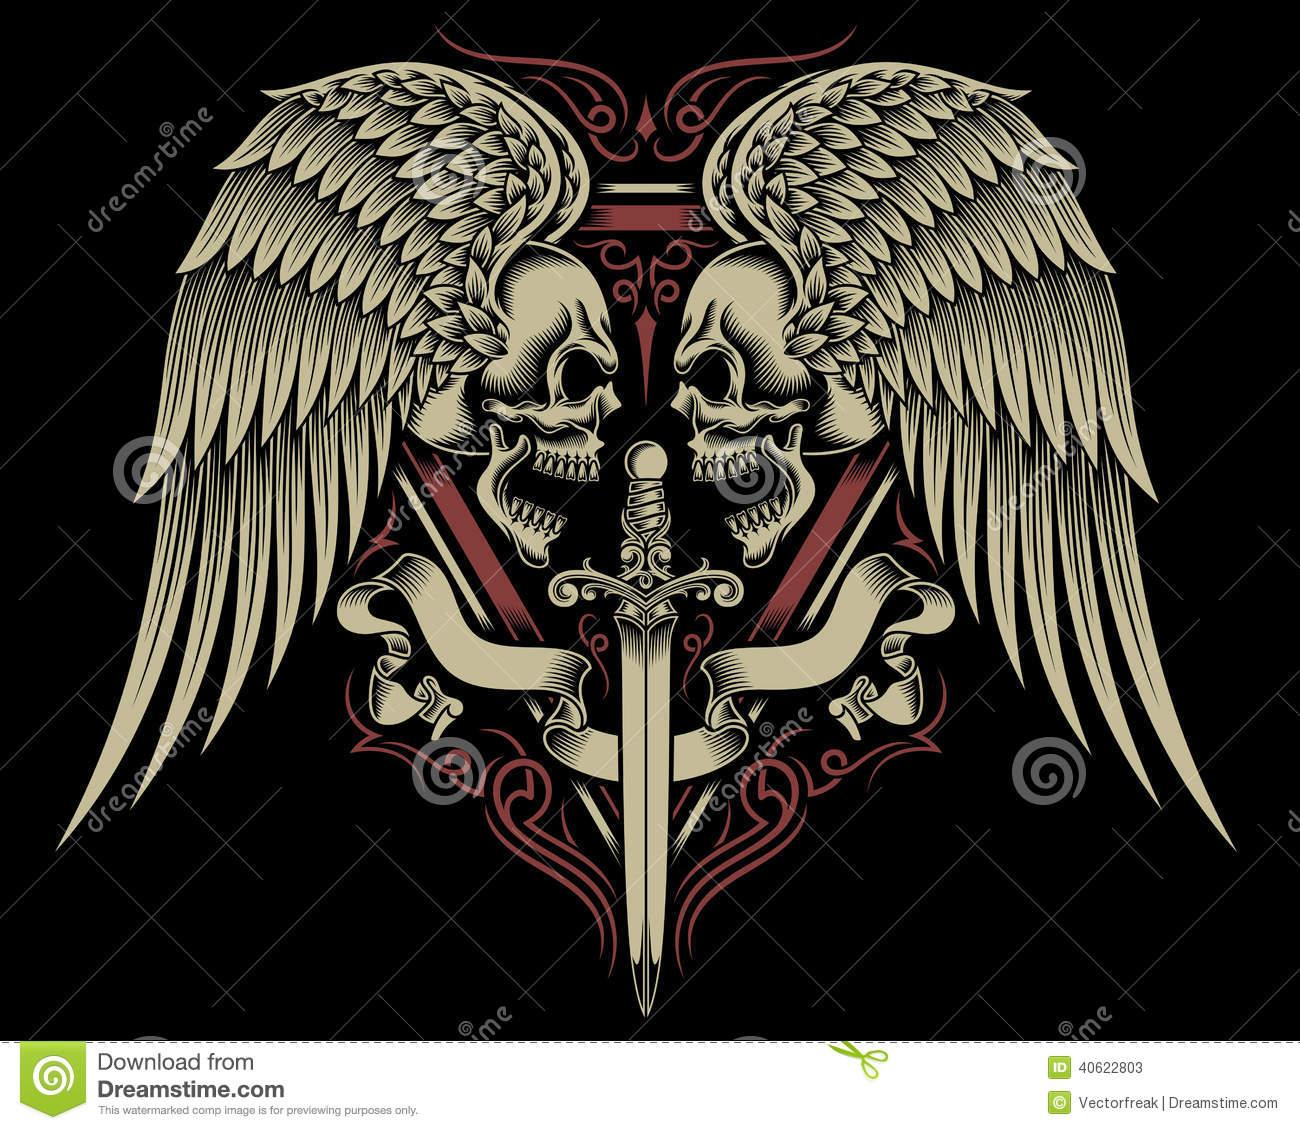 skull-flames-Google-Search-wallpaper-wp422457